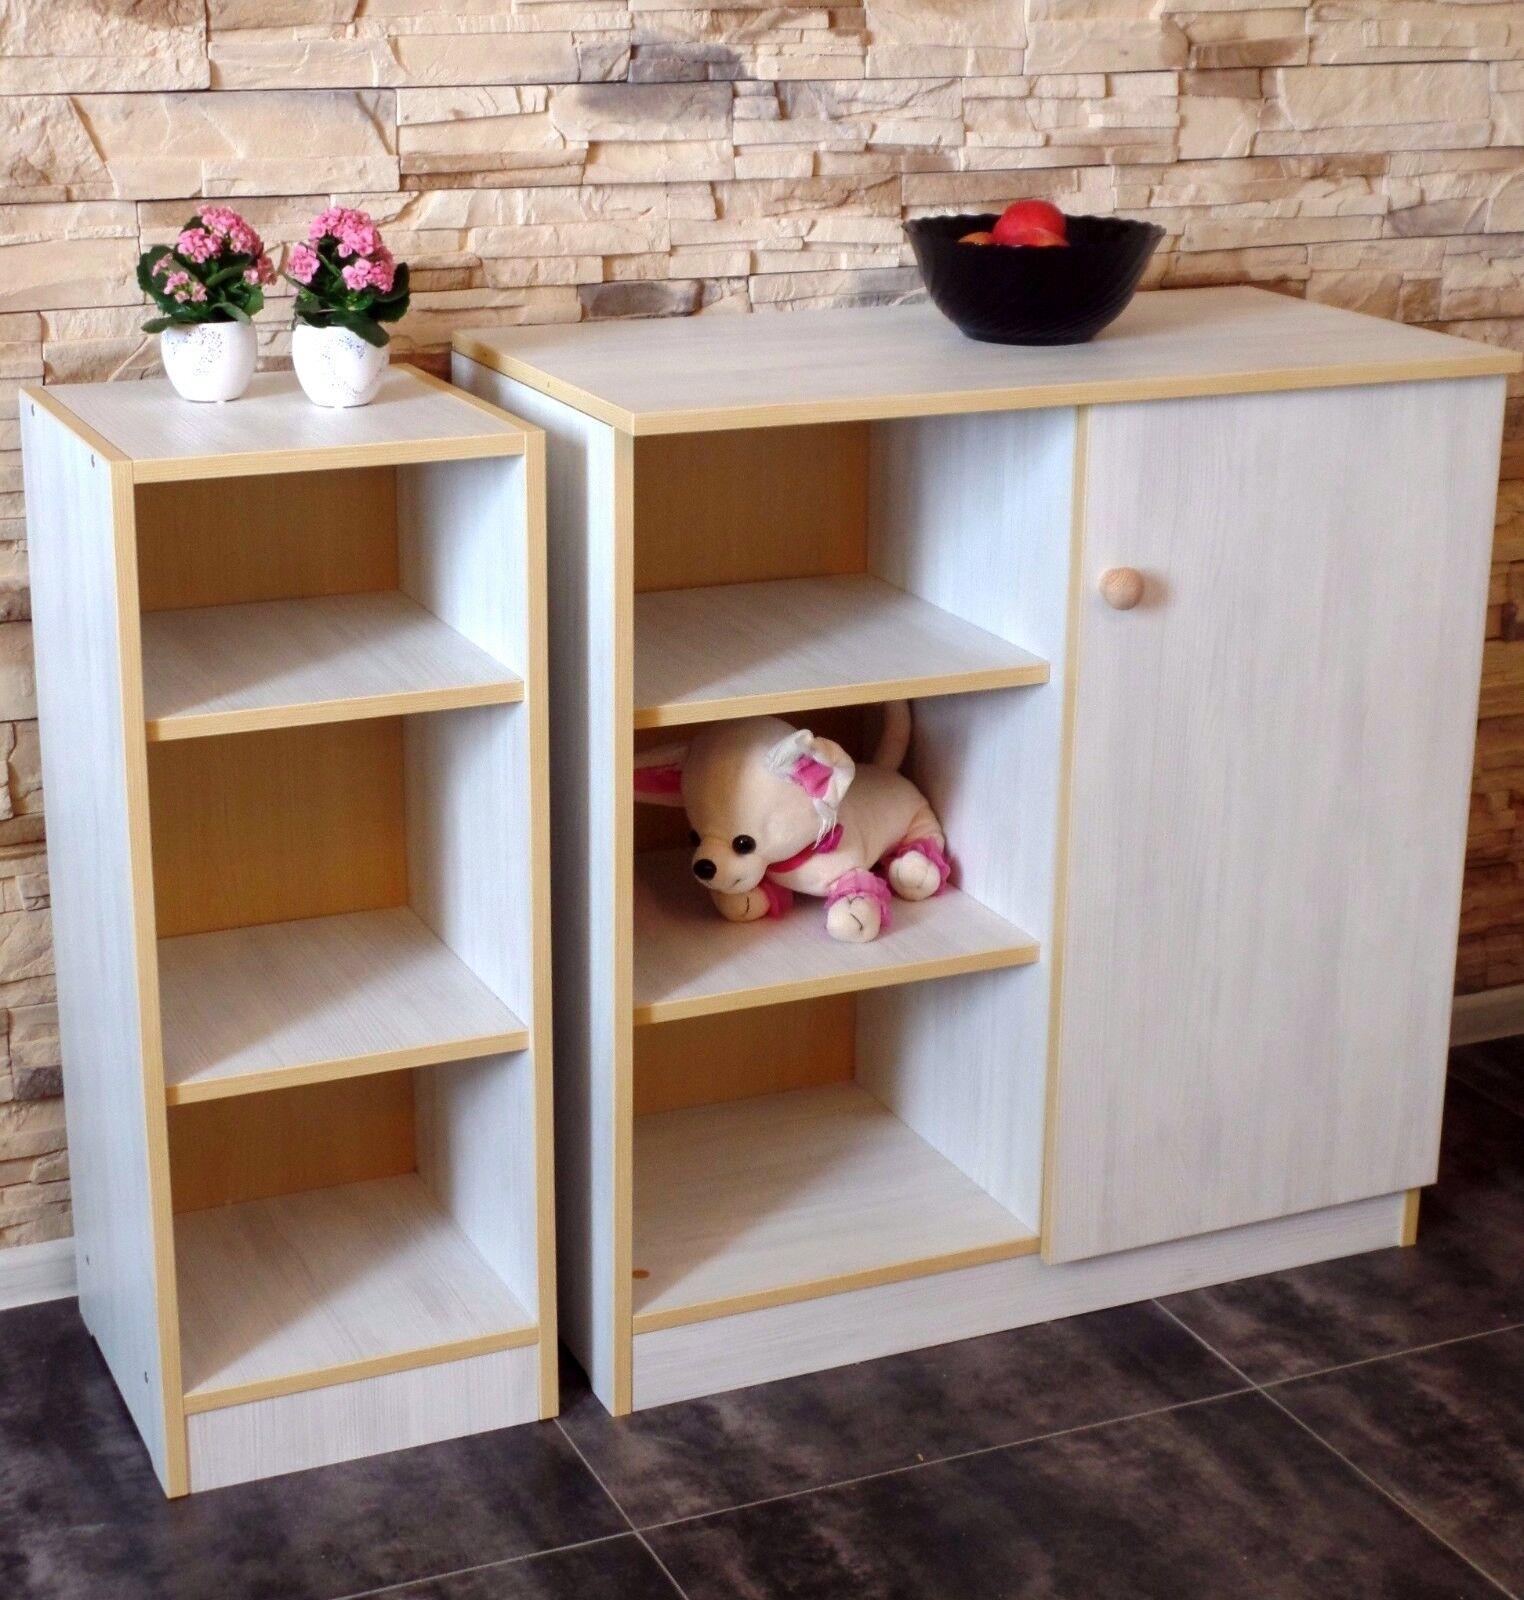 kinderbett jugendbett 100x200 kojenbett funktionsbett. Black Bedroom Furniture Sets. Home Design Ideas